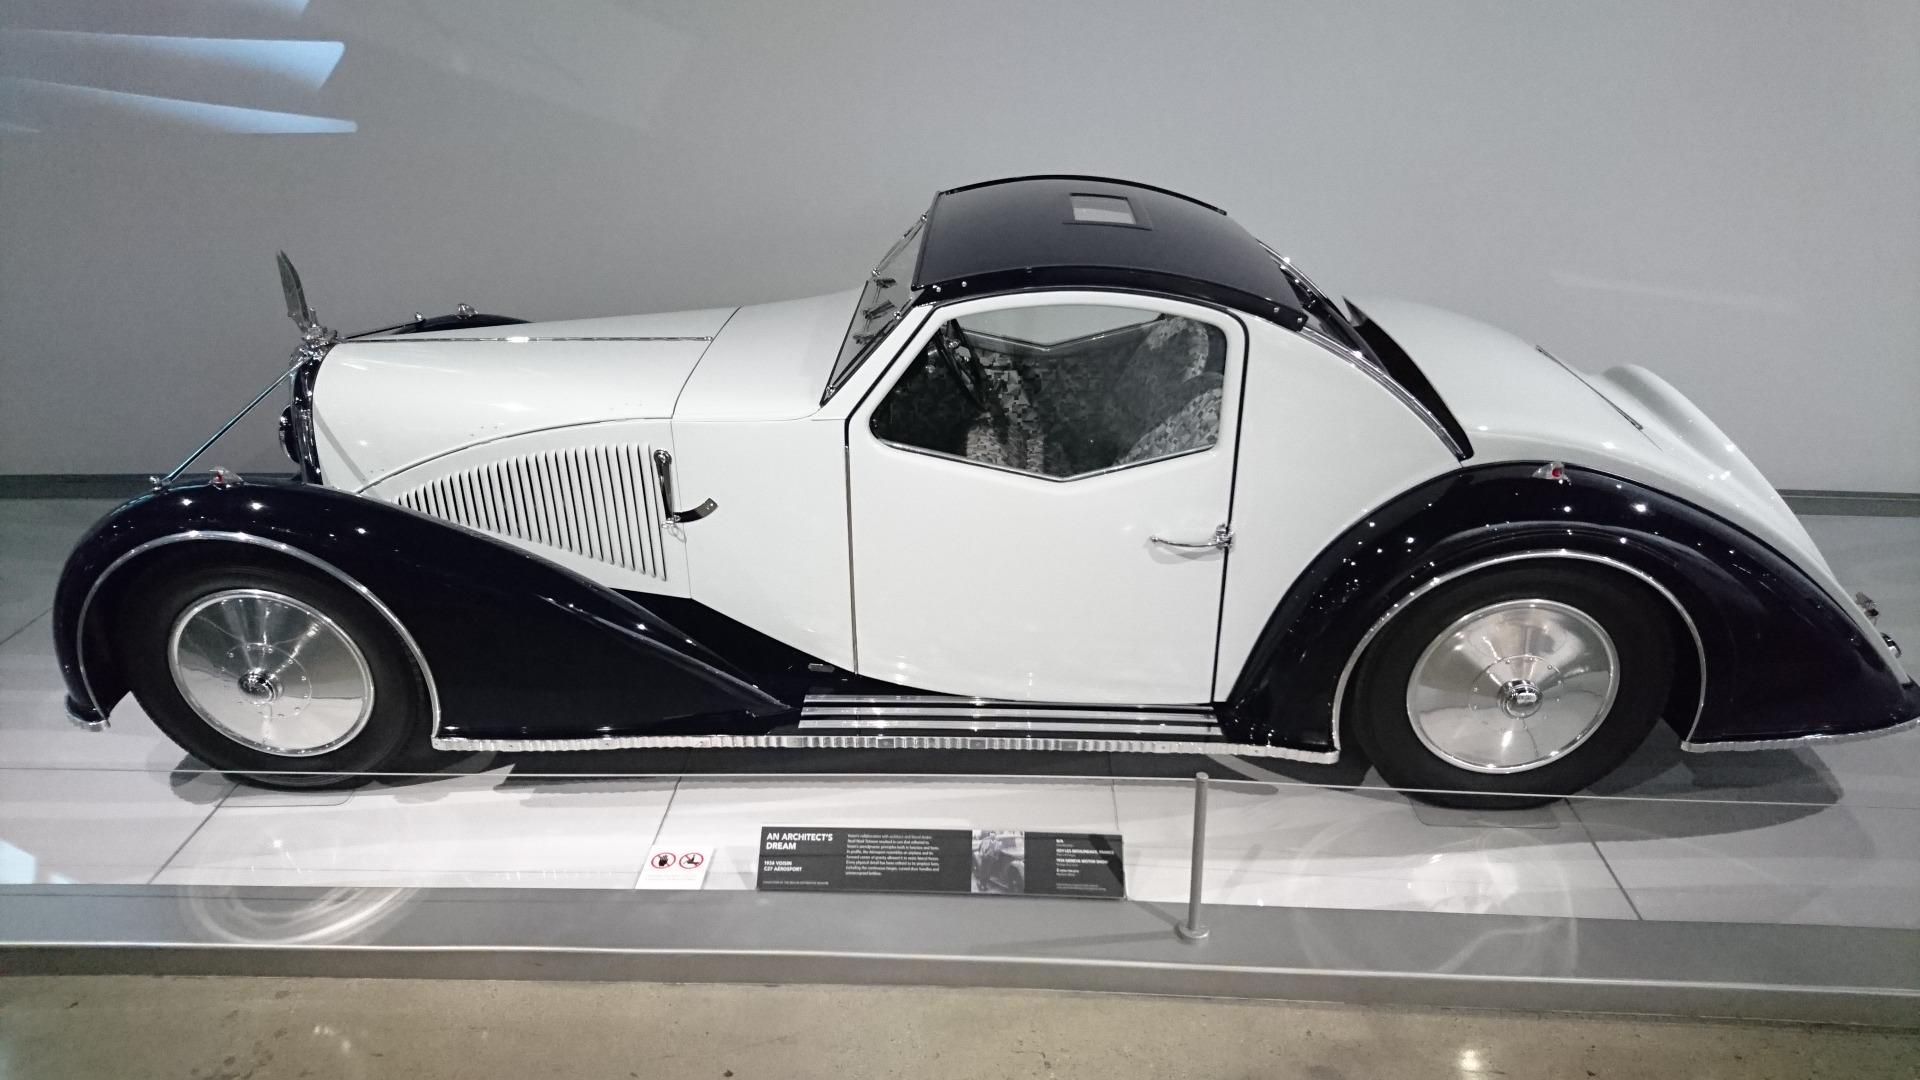 Voisin C27 Aerosport Coupe (Ove)